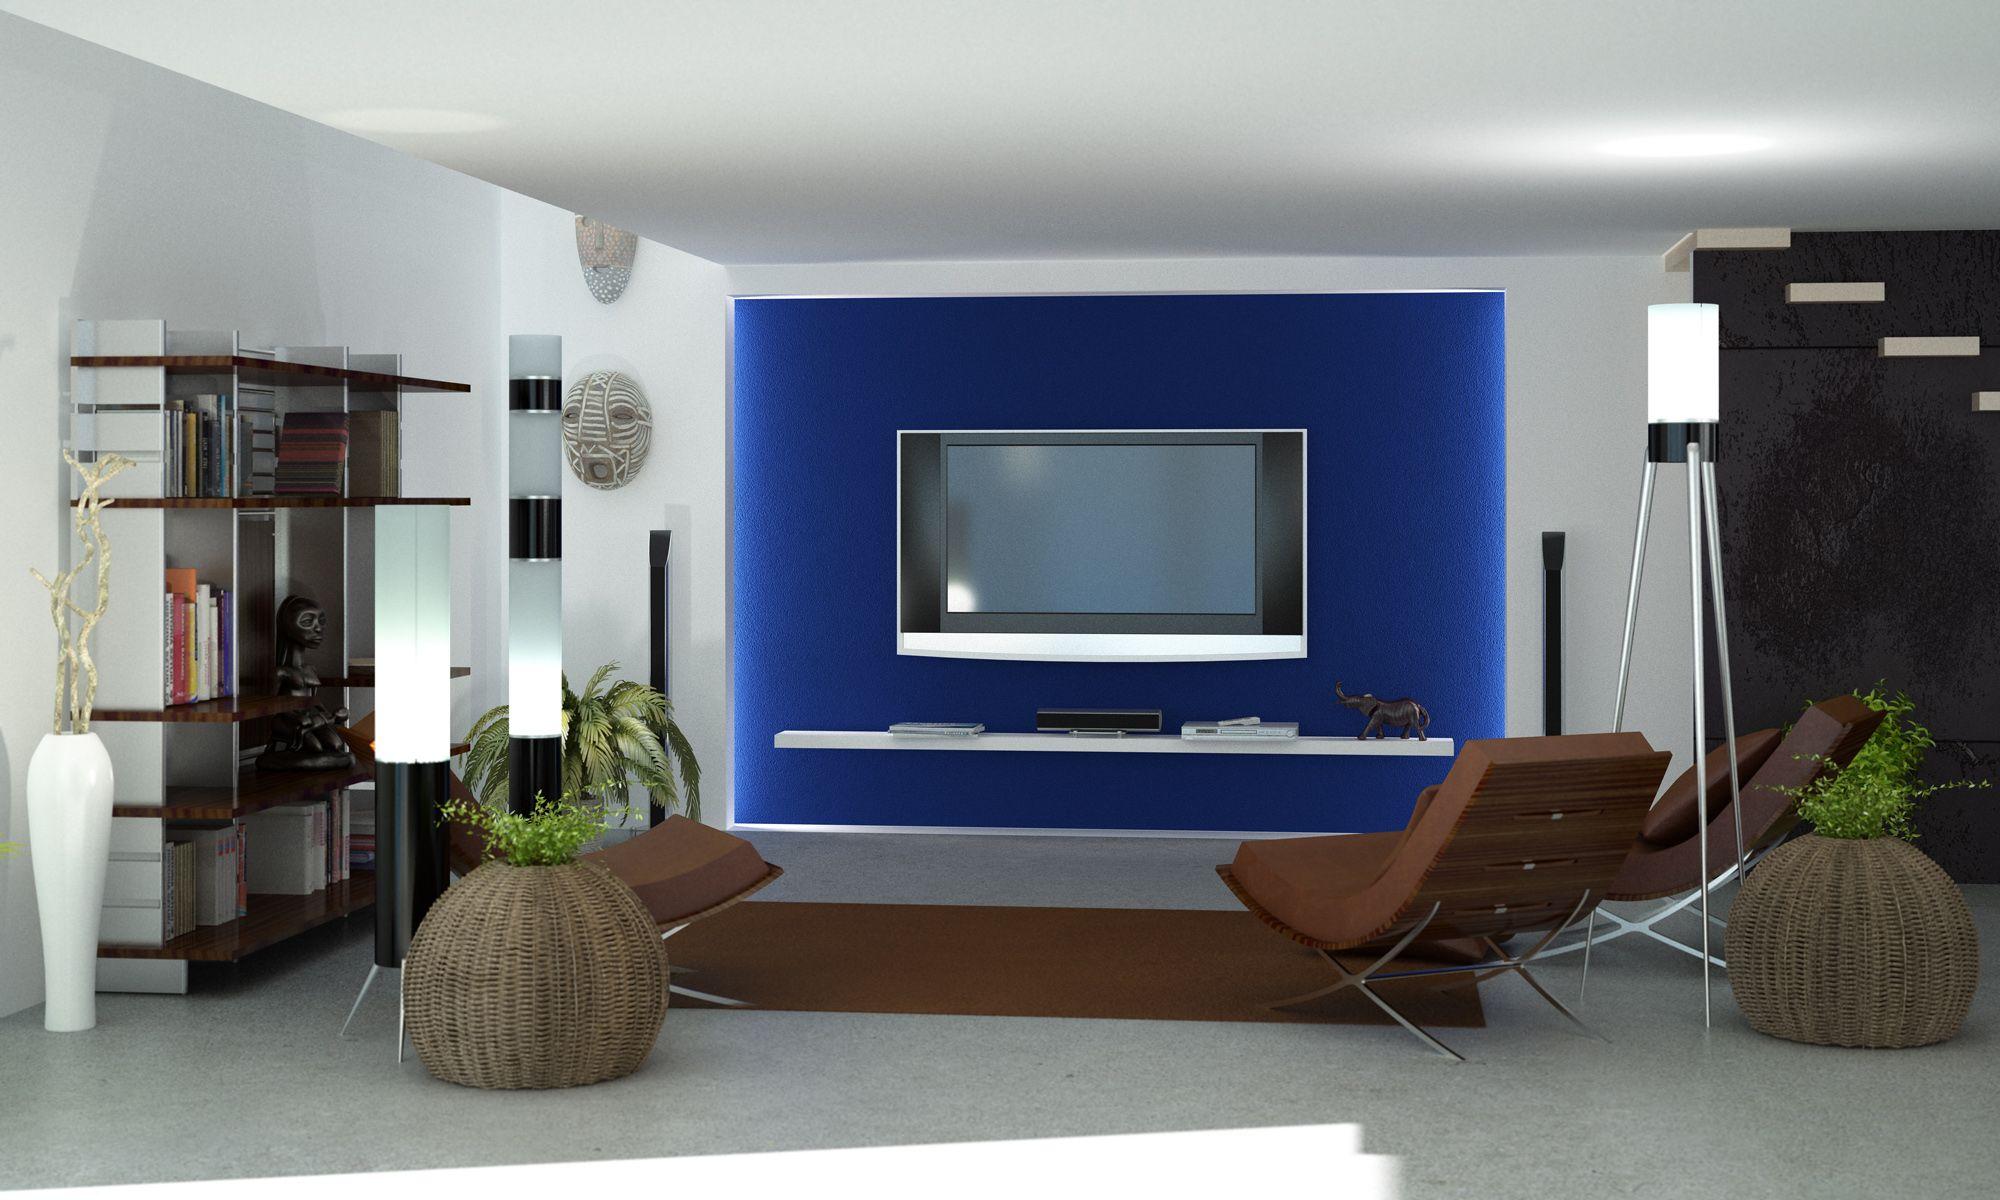 best 25 lampadaire liseuse ideas on pinterest liseuse. Black Bedroom Furniture Sets. Home Design Ideas